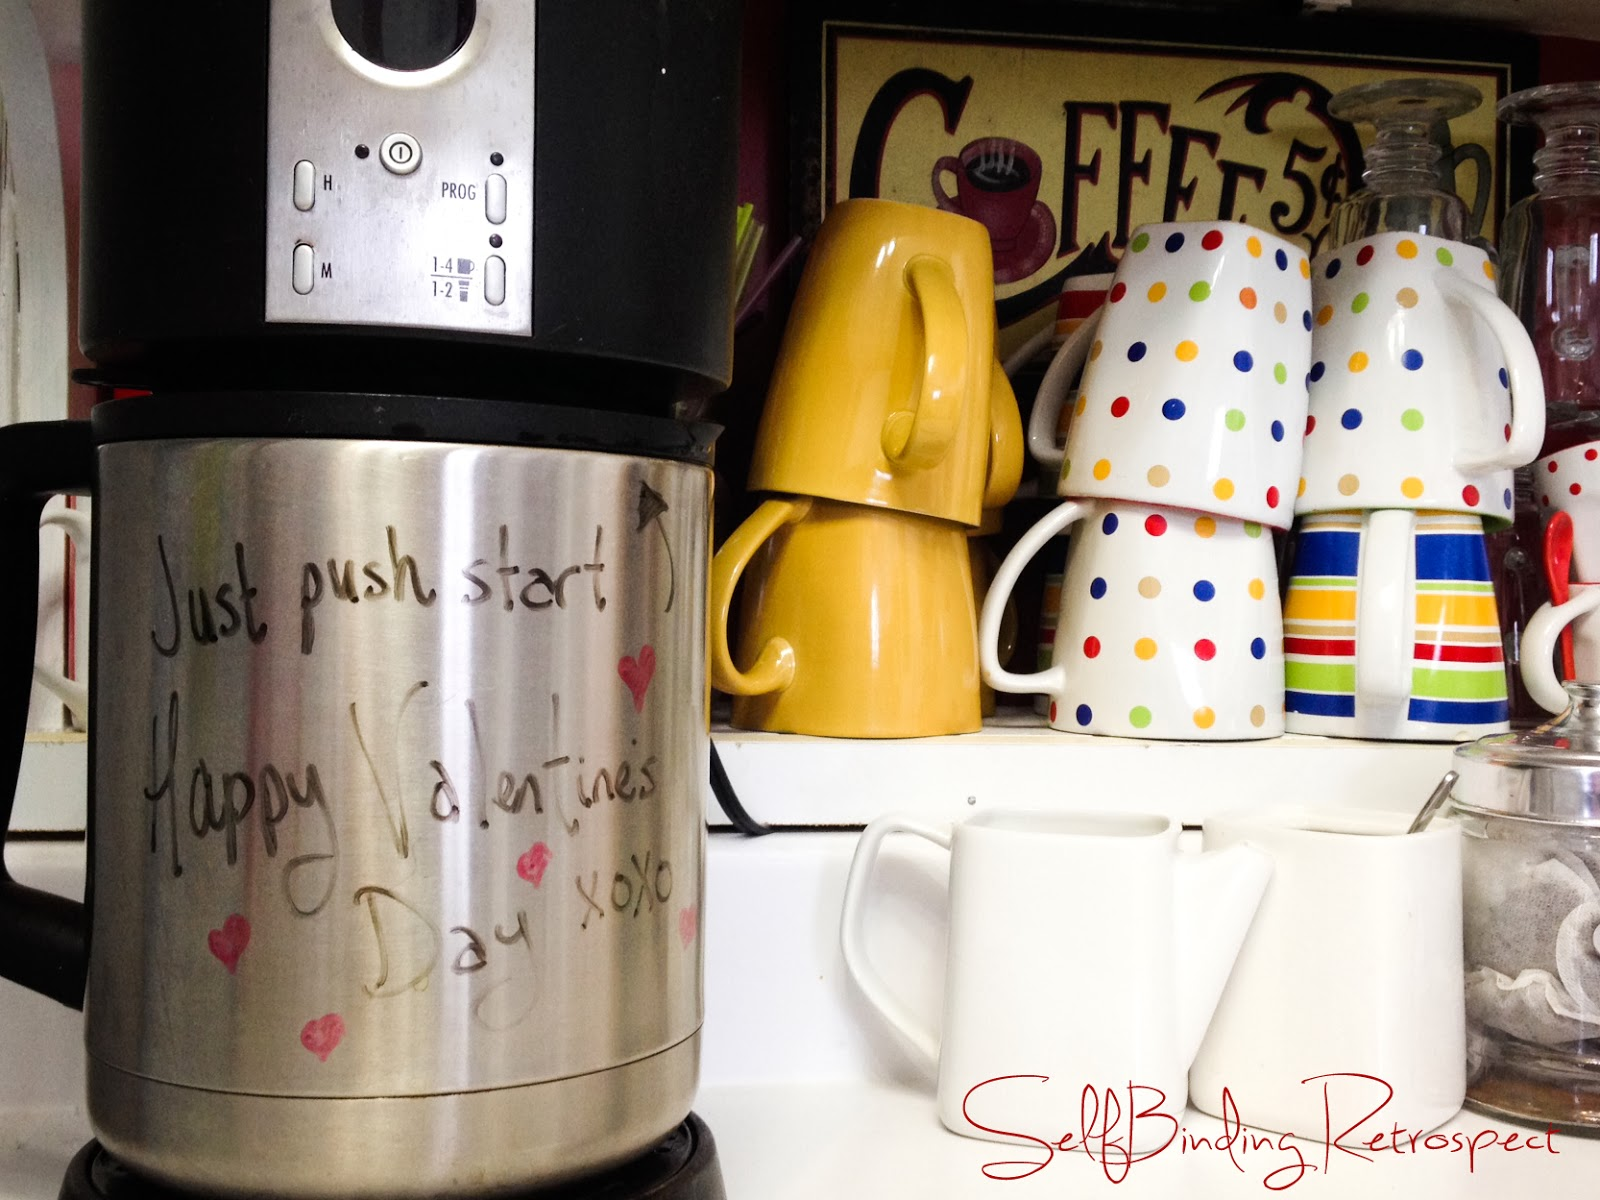 coffee maker, happy valentine's day message